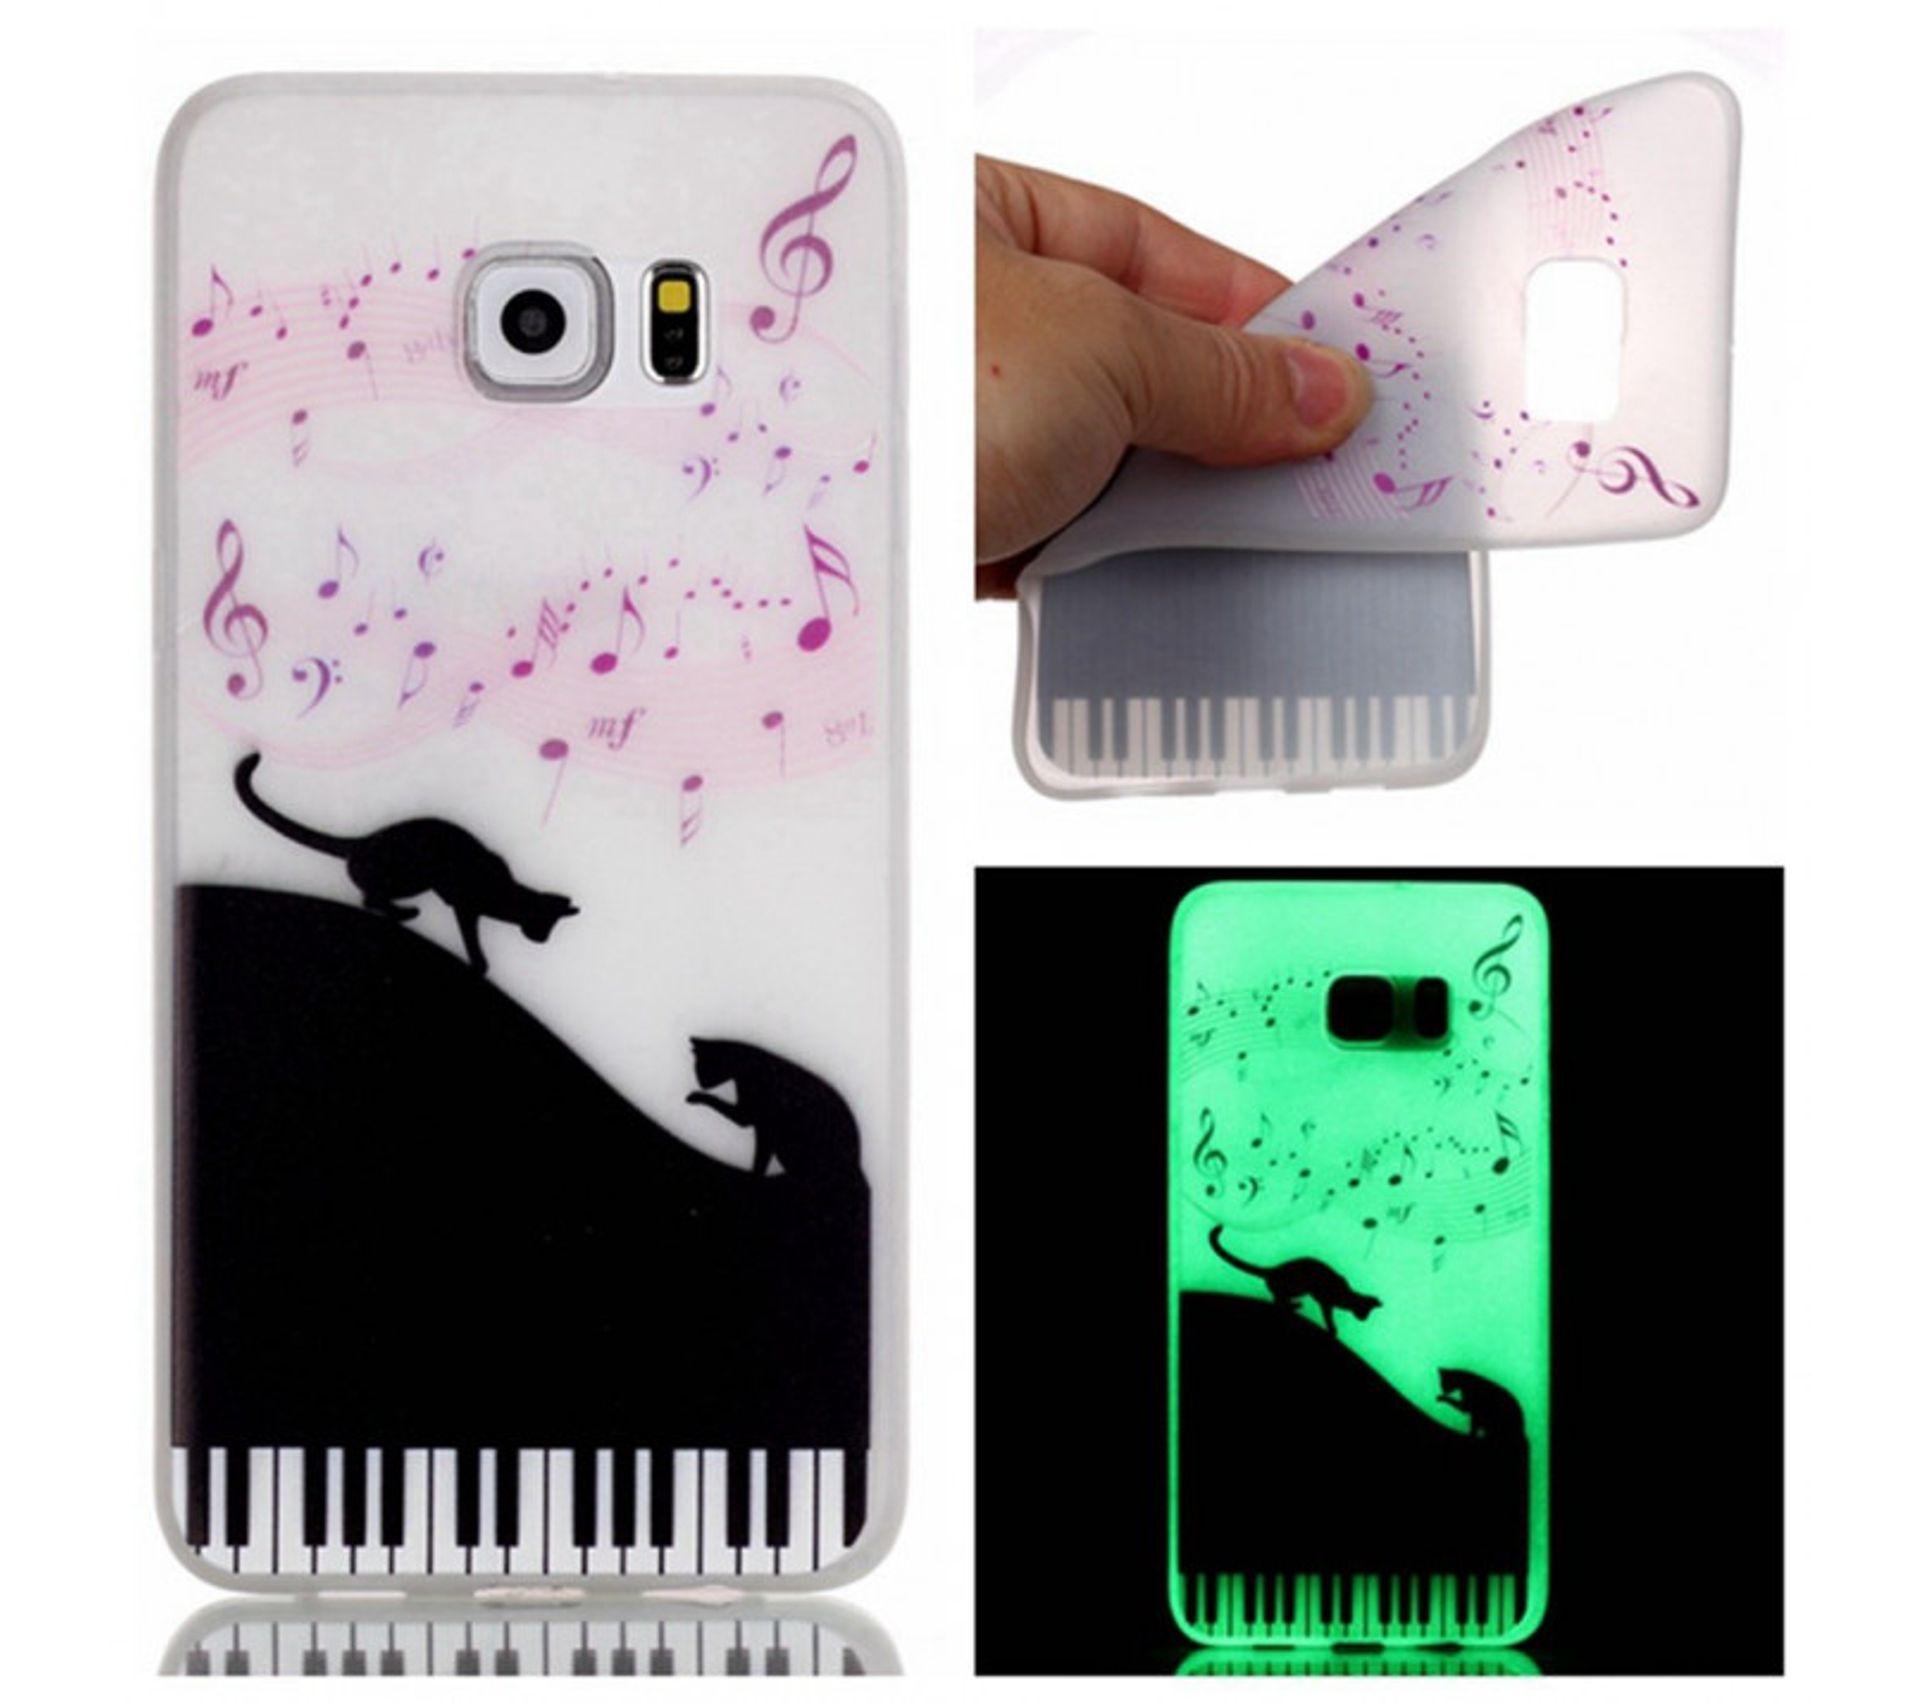 Coque Souple Pour Samsung Galaxy S7 Phosphorescente Motif Note De Musique